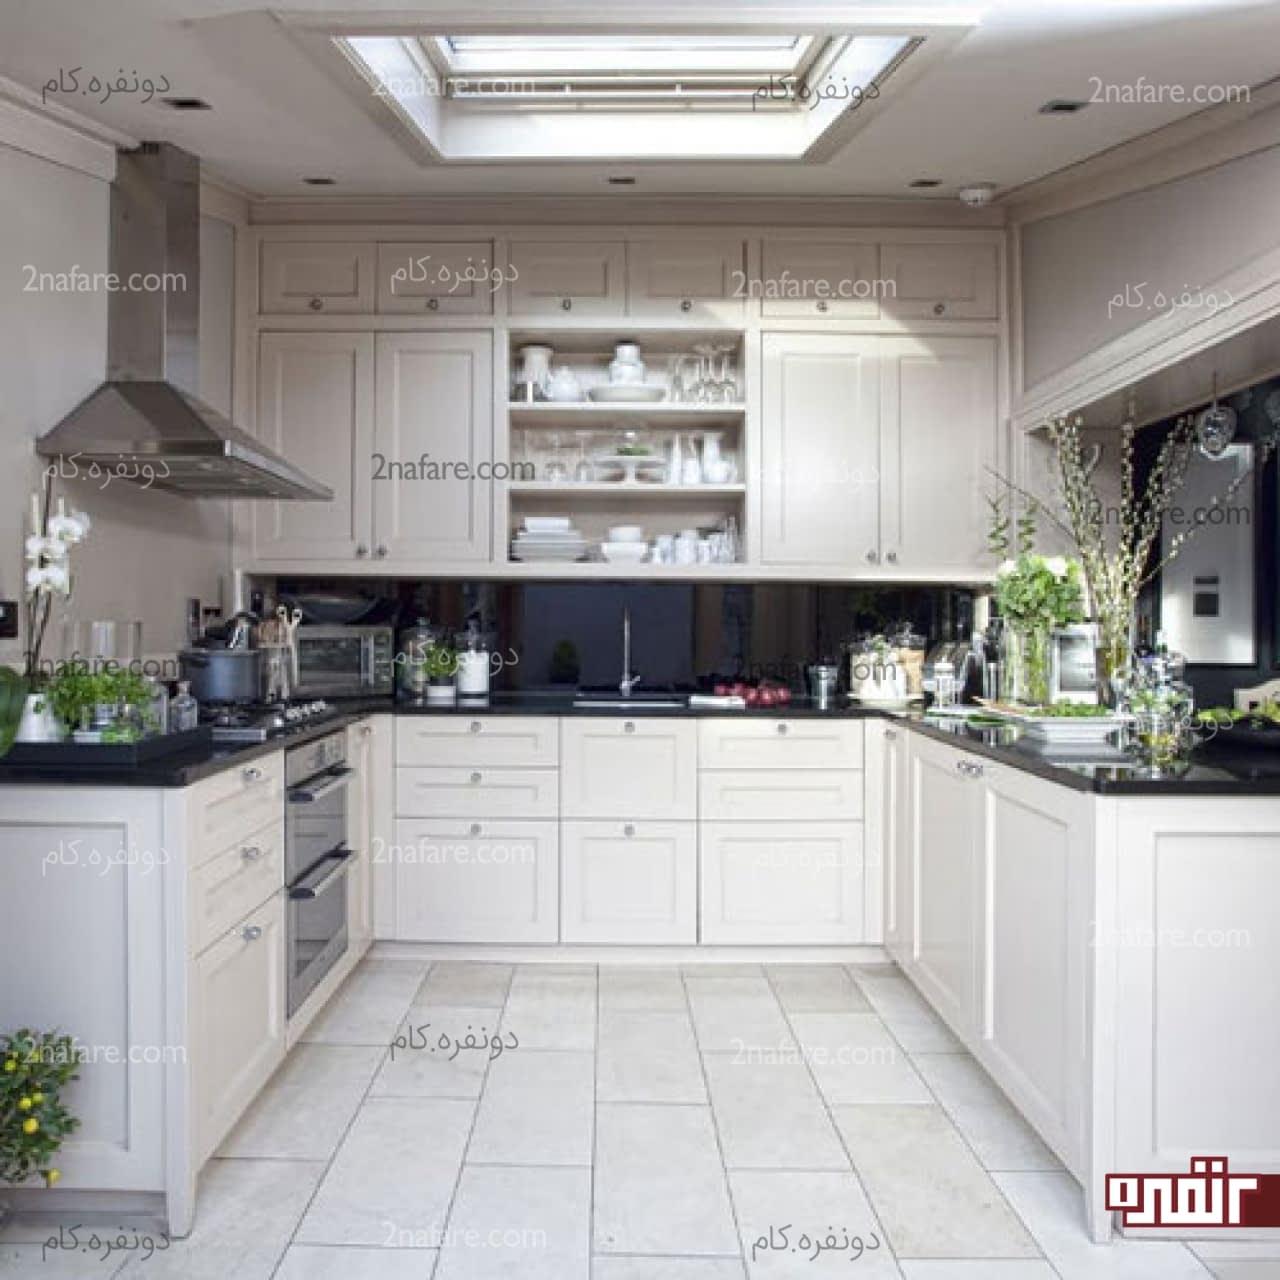 Kitchen Designs For U Shaped Layout: طراحی های پرطرفدار آشپزخانه مدرن • دونفره